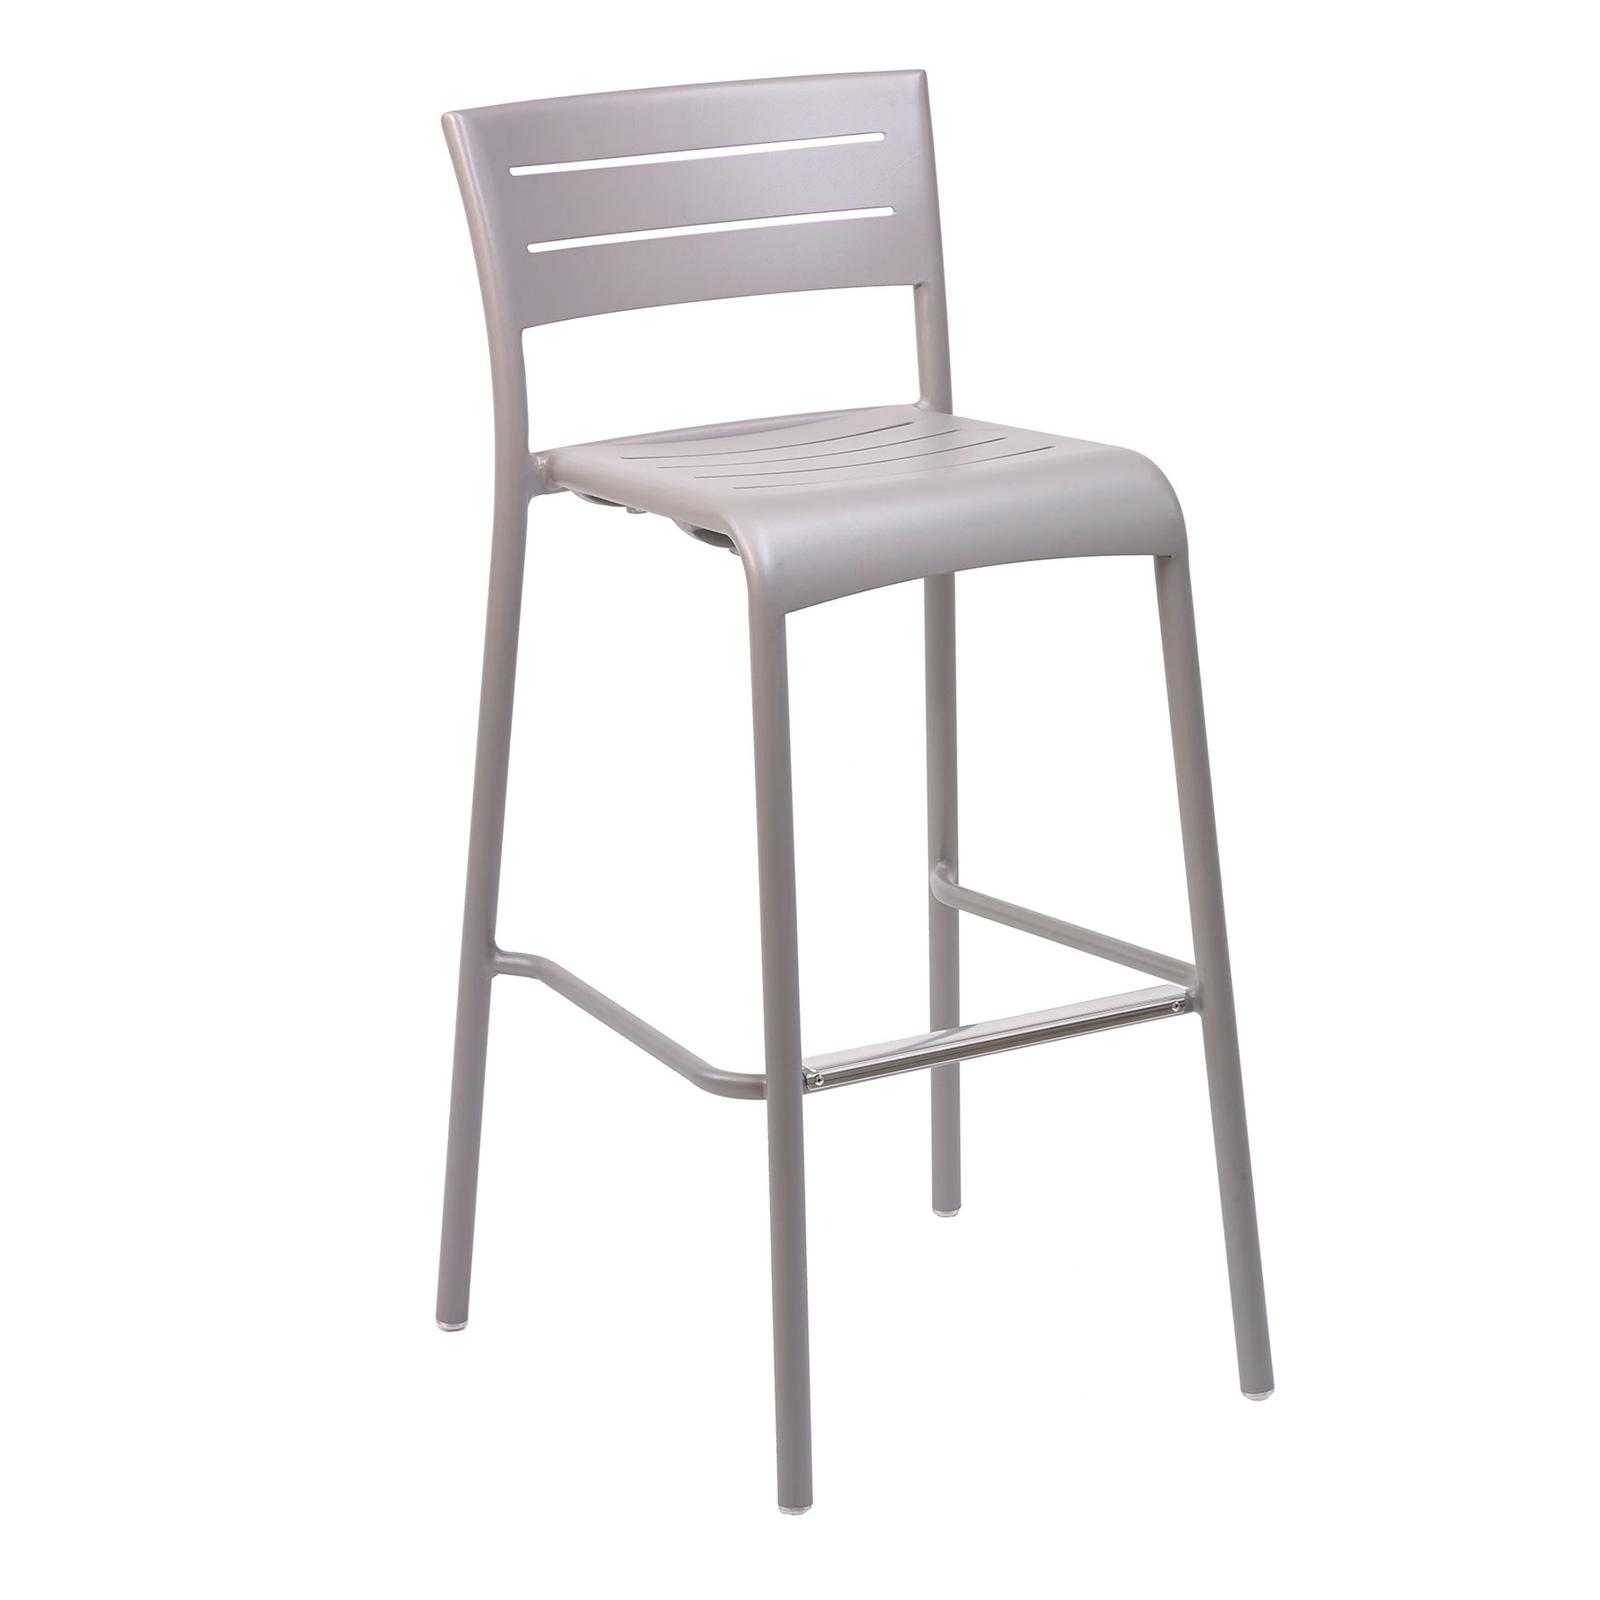 Florida Seating BAL-5000 S WARM GRAY/SILVER bar stool, stacking, outdoor